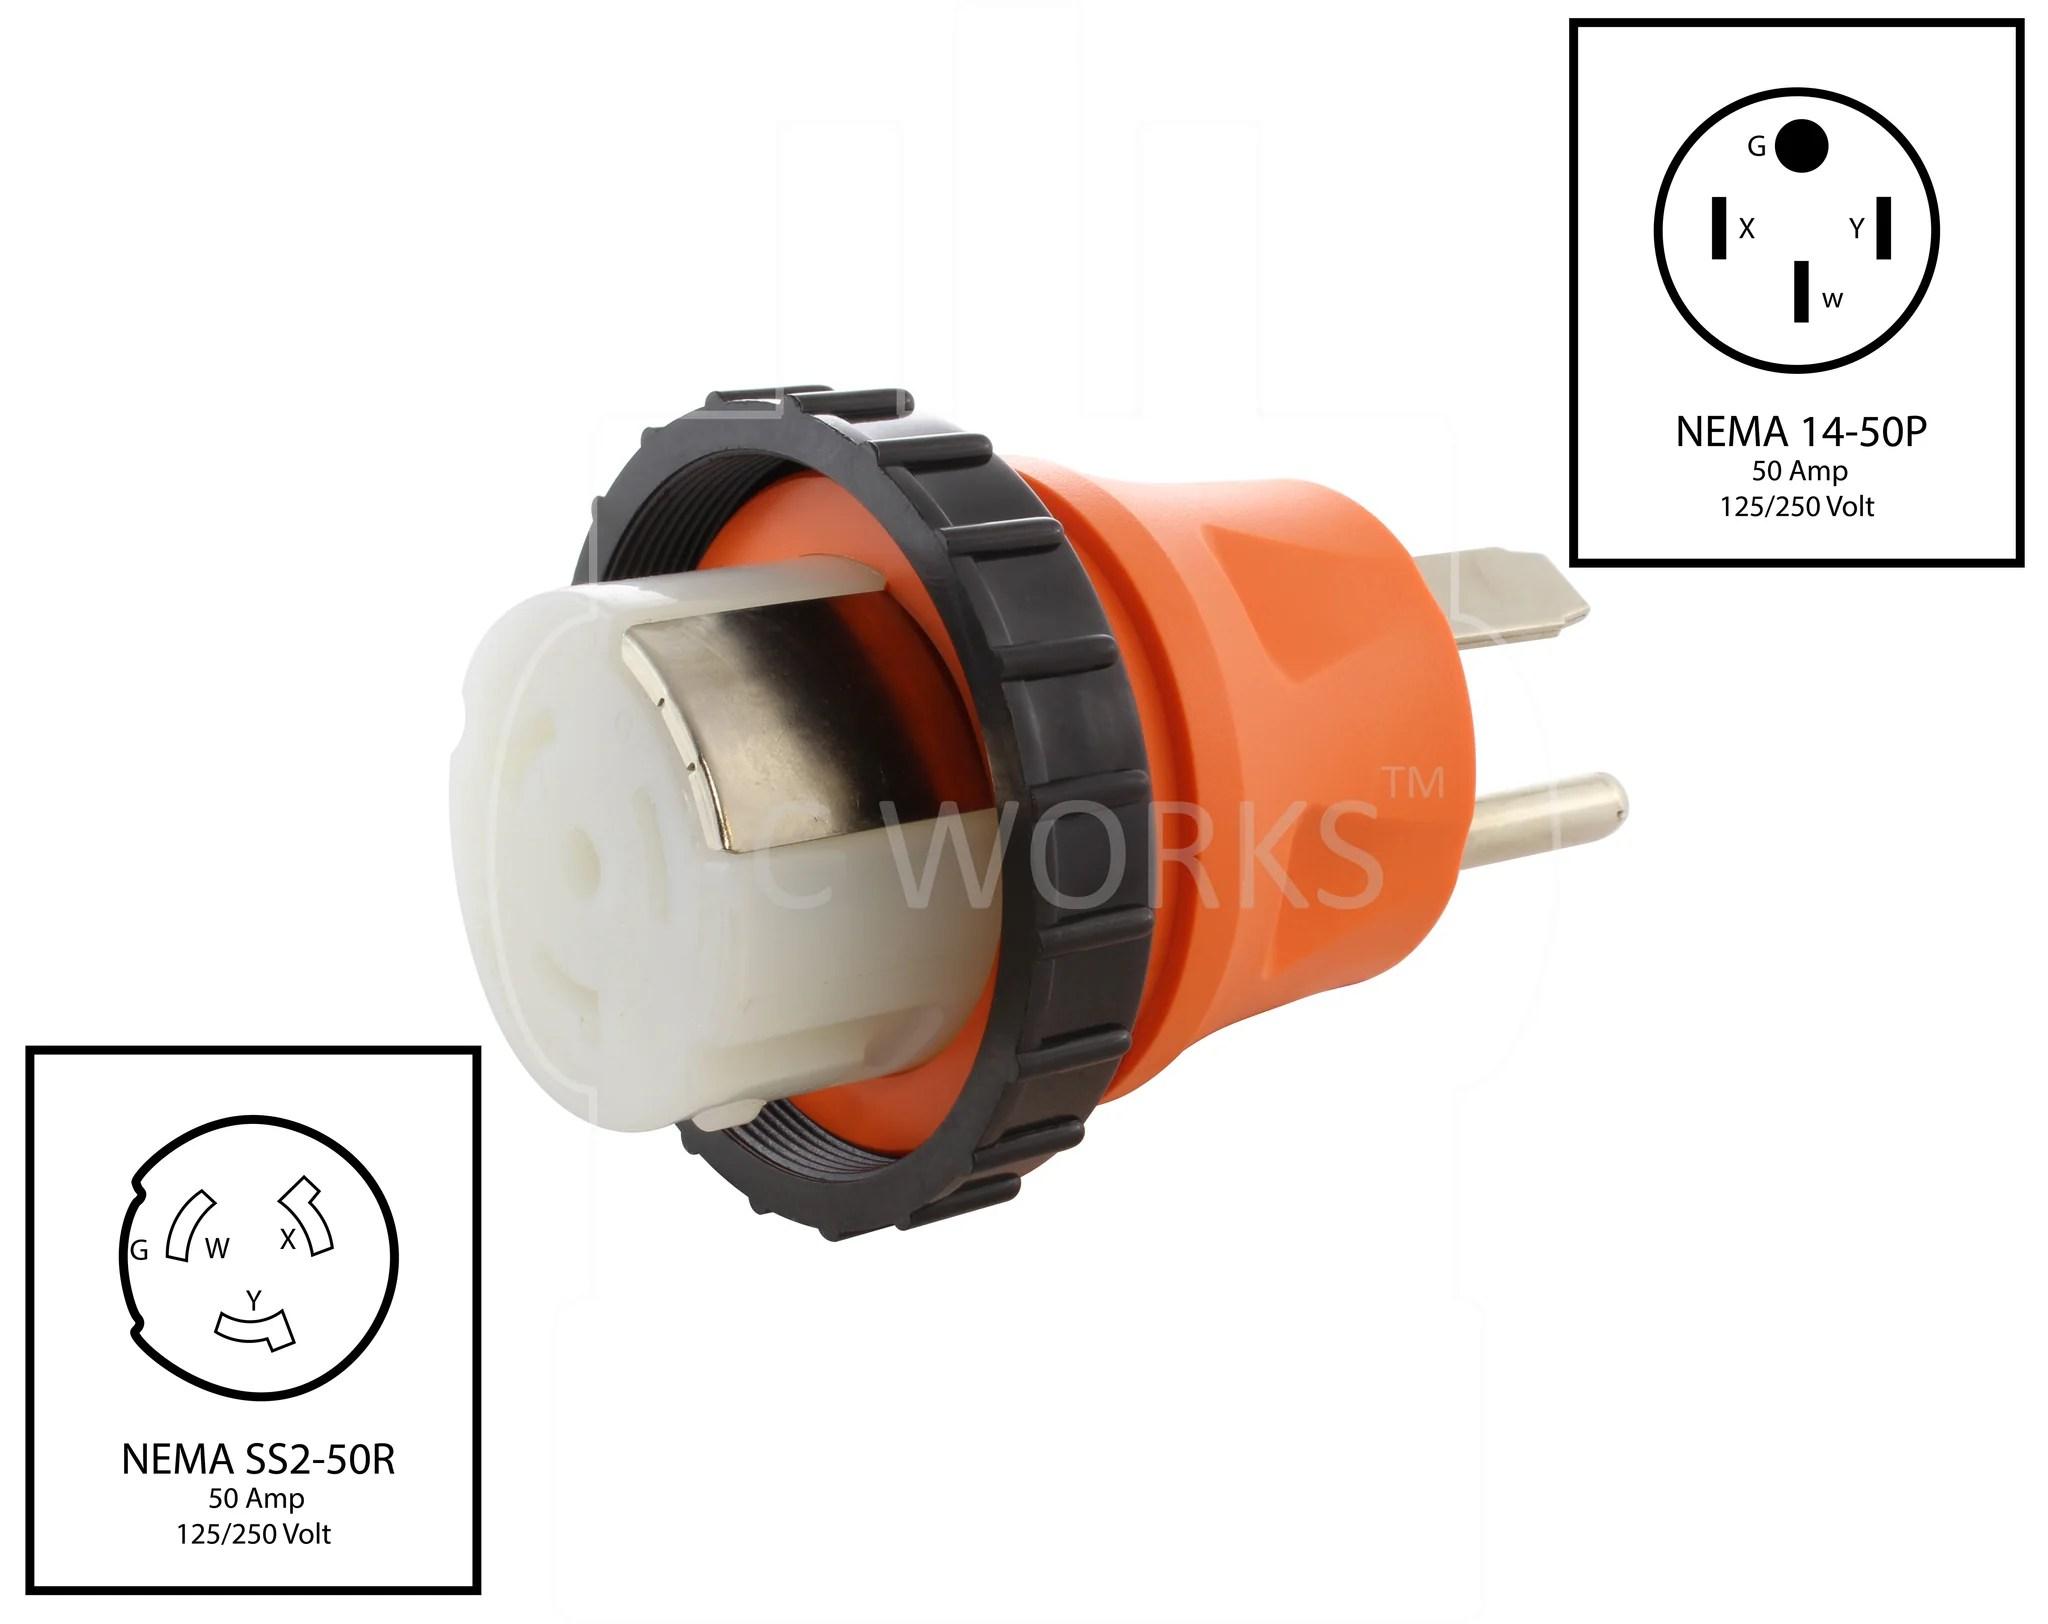 hight resolution of  nema 14 50p to nema ss2 50r 50 amp adapter 50 amp